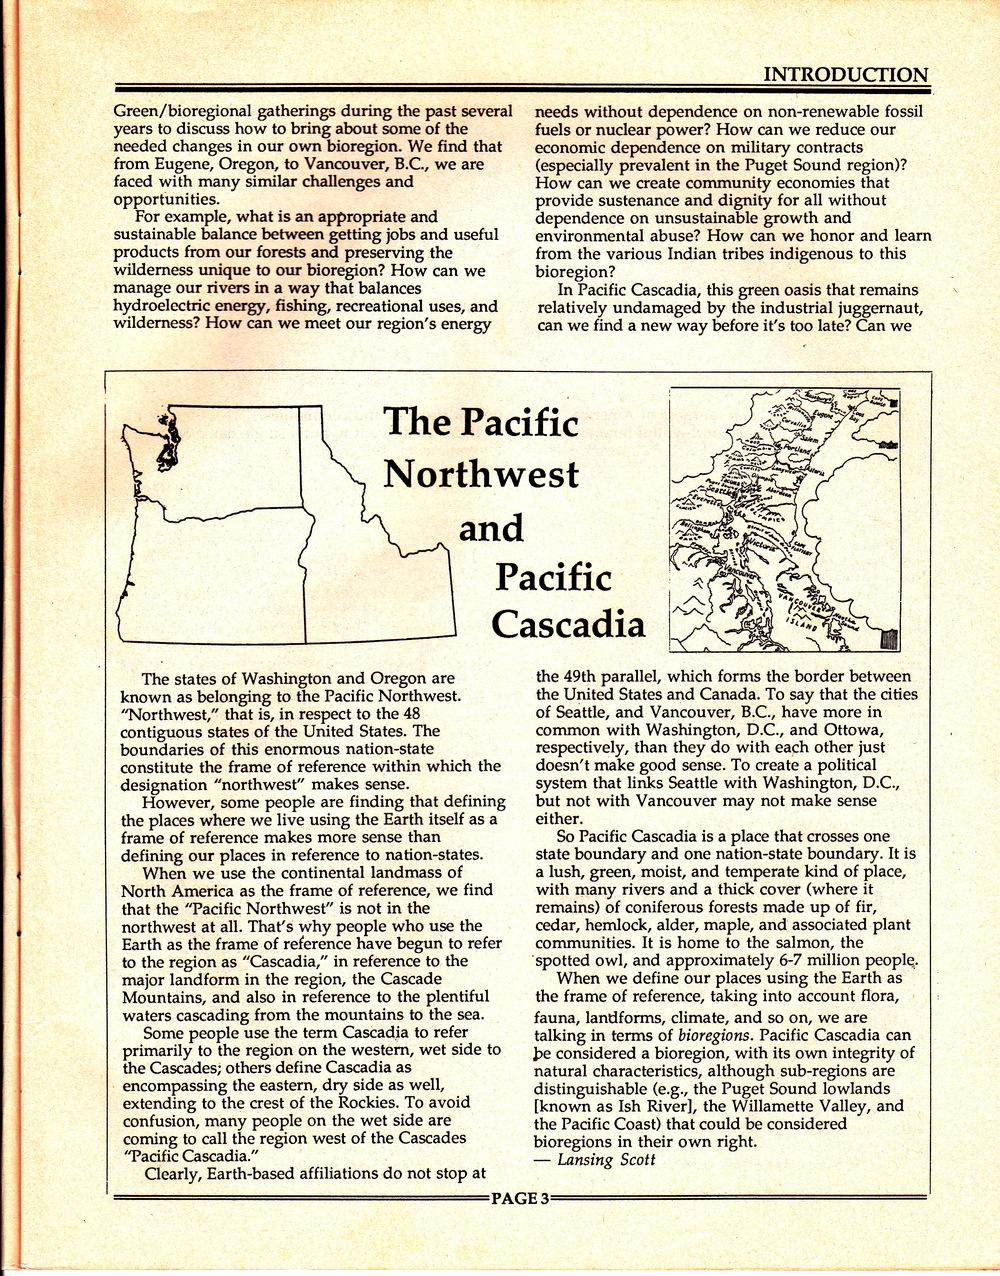 Cascadia Bioregional Congress 1986 Proceedings_0023.jpg